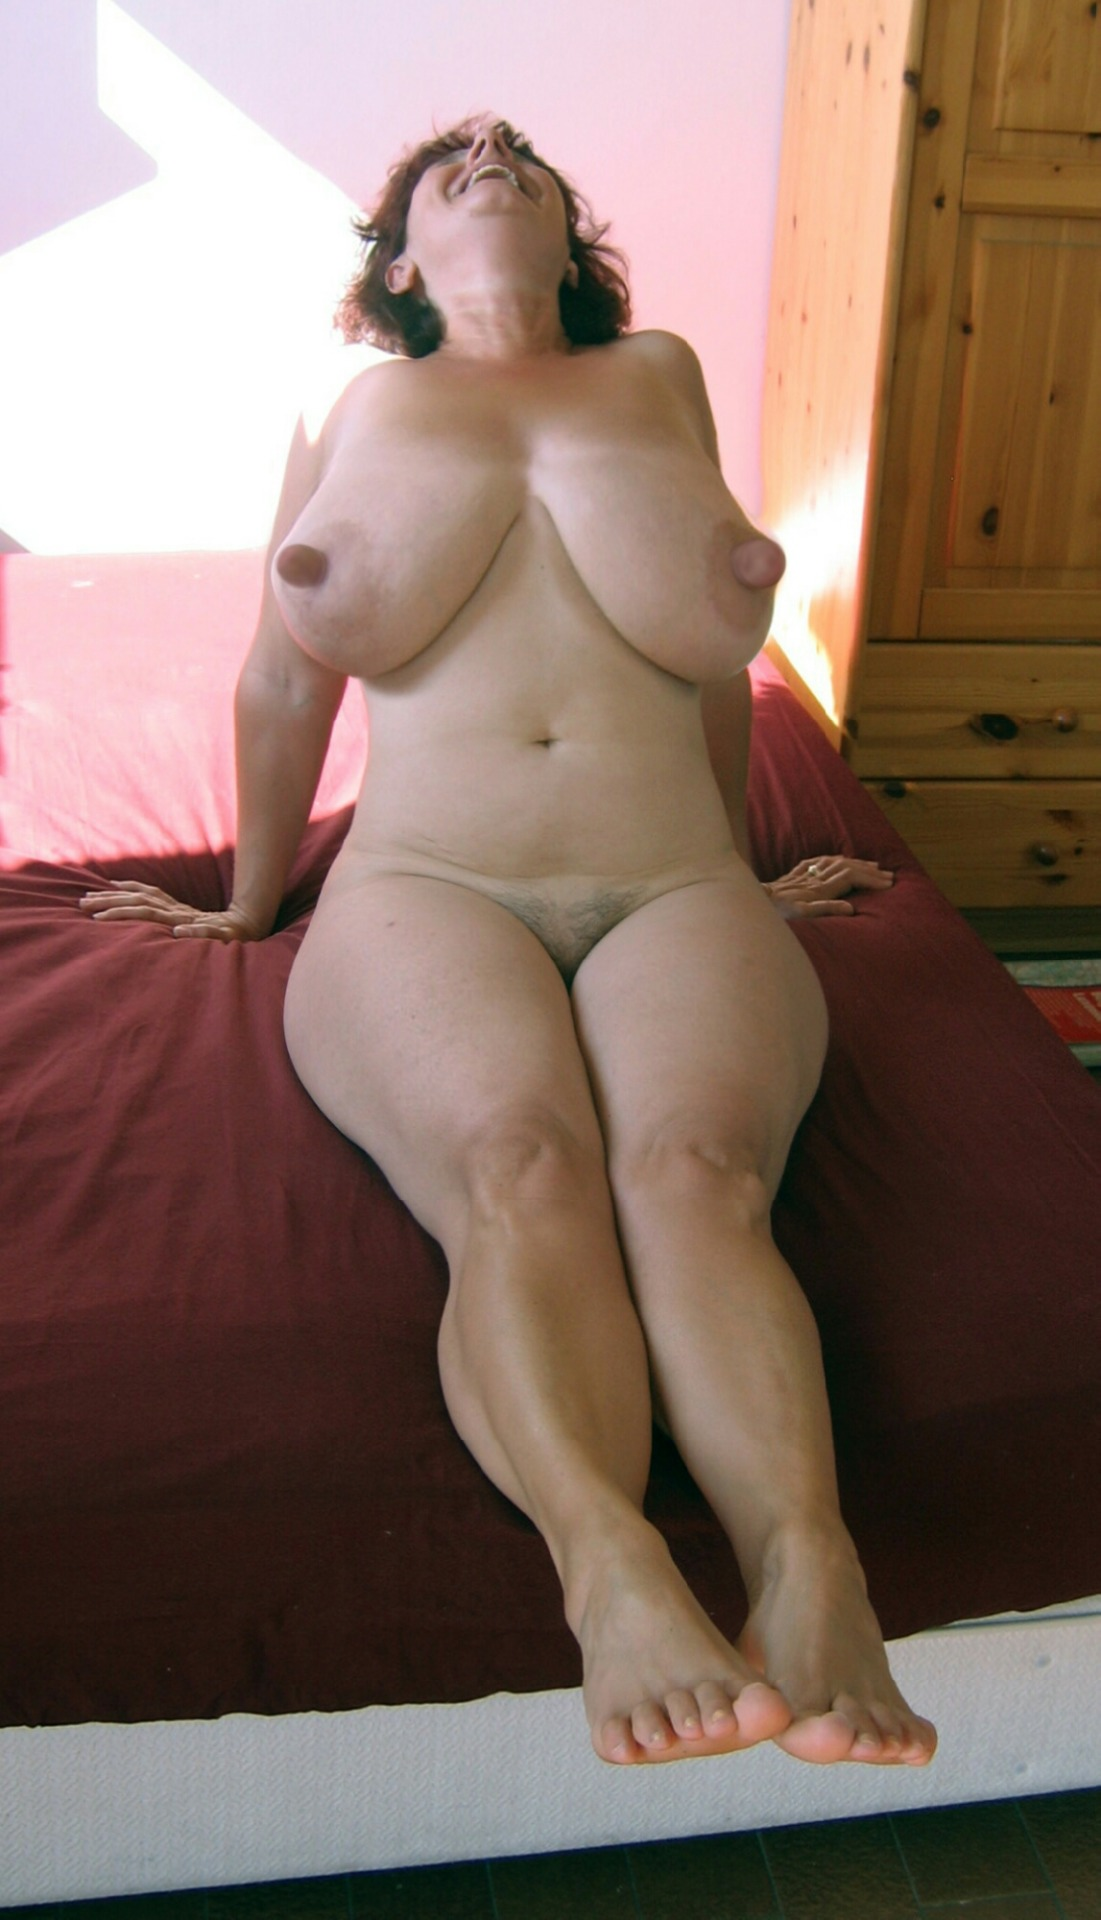 natural hanging boobs tumblr